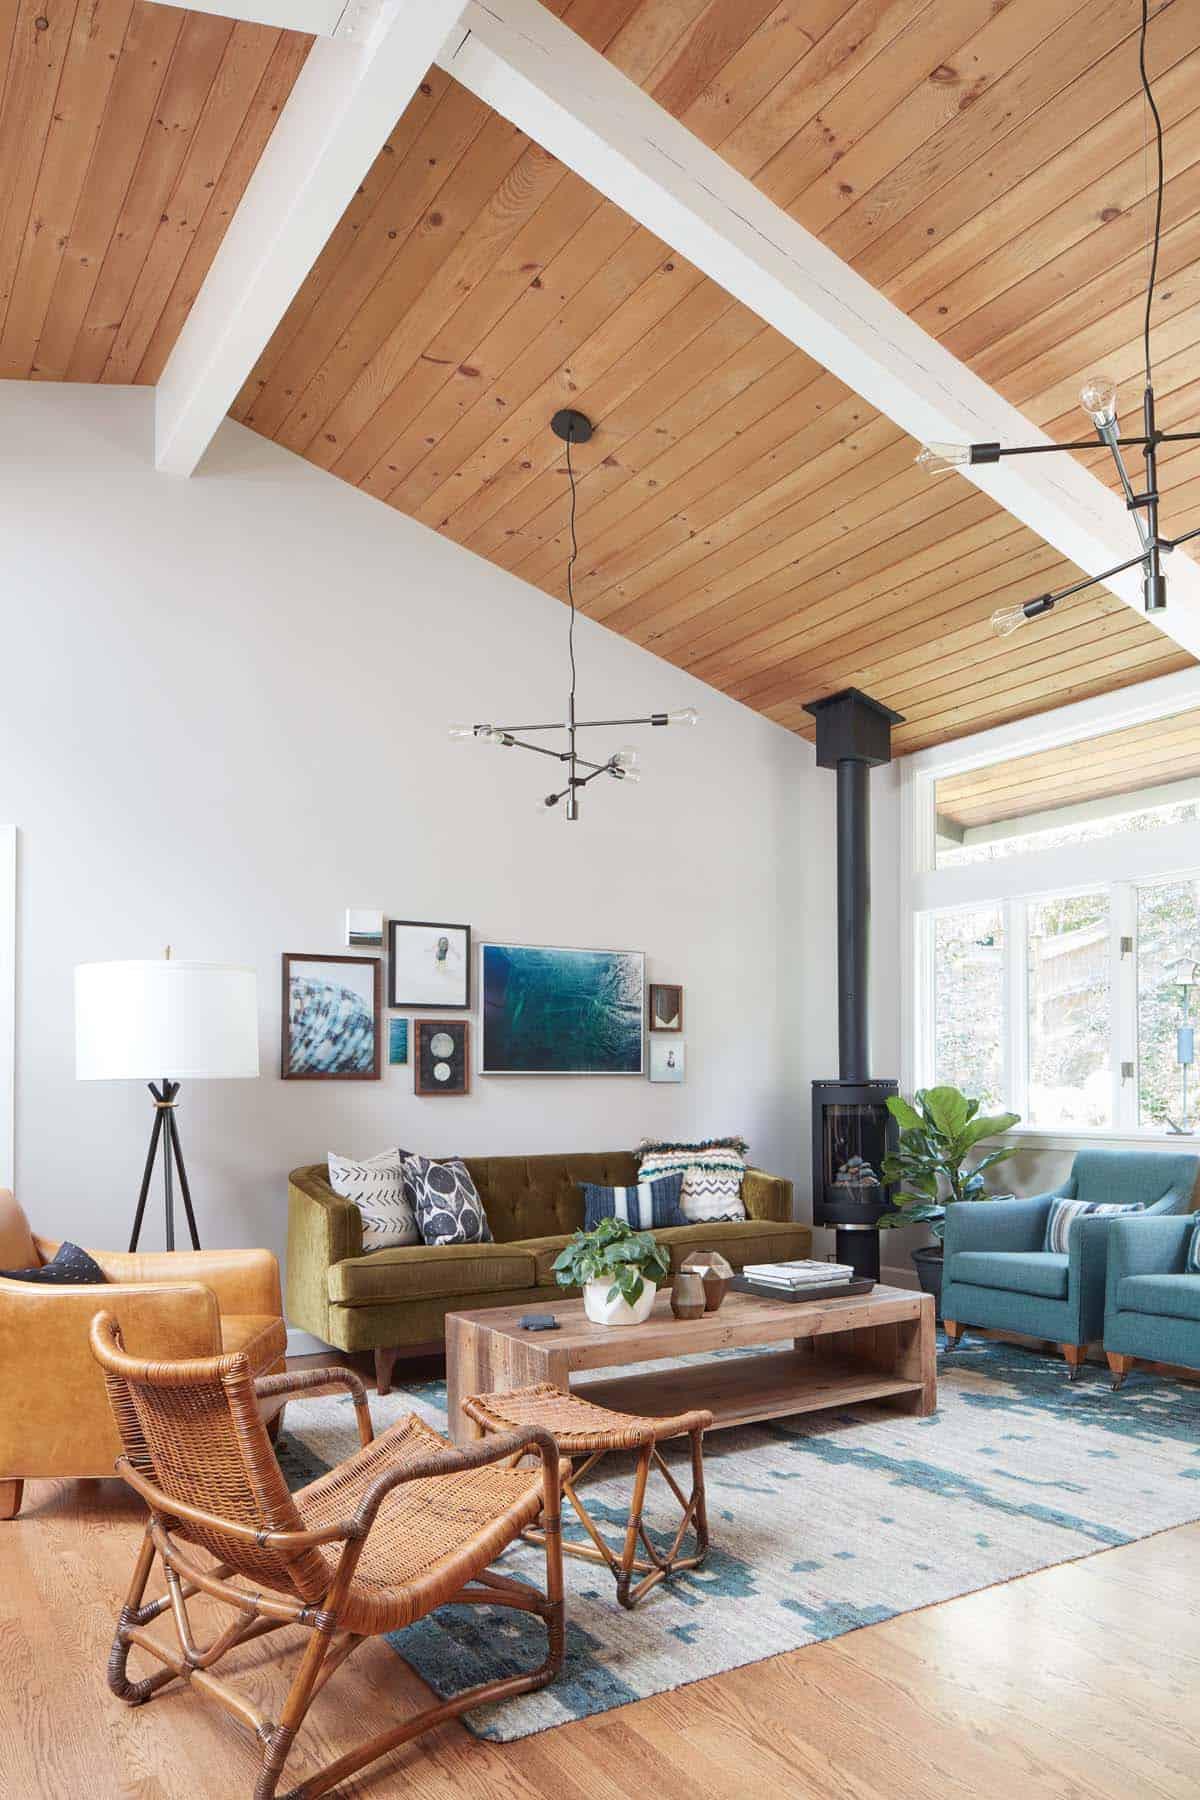 Coastal Style Interiors-Kristina Crestin Design-02-1 Kindesign